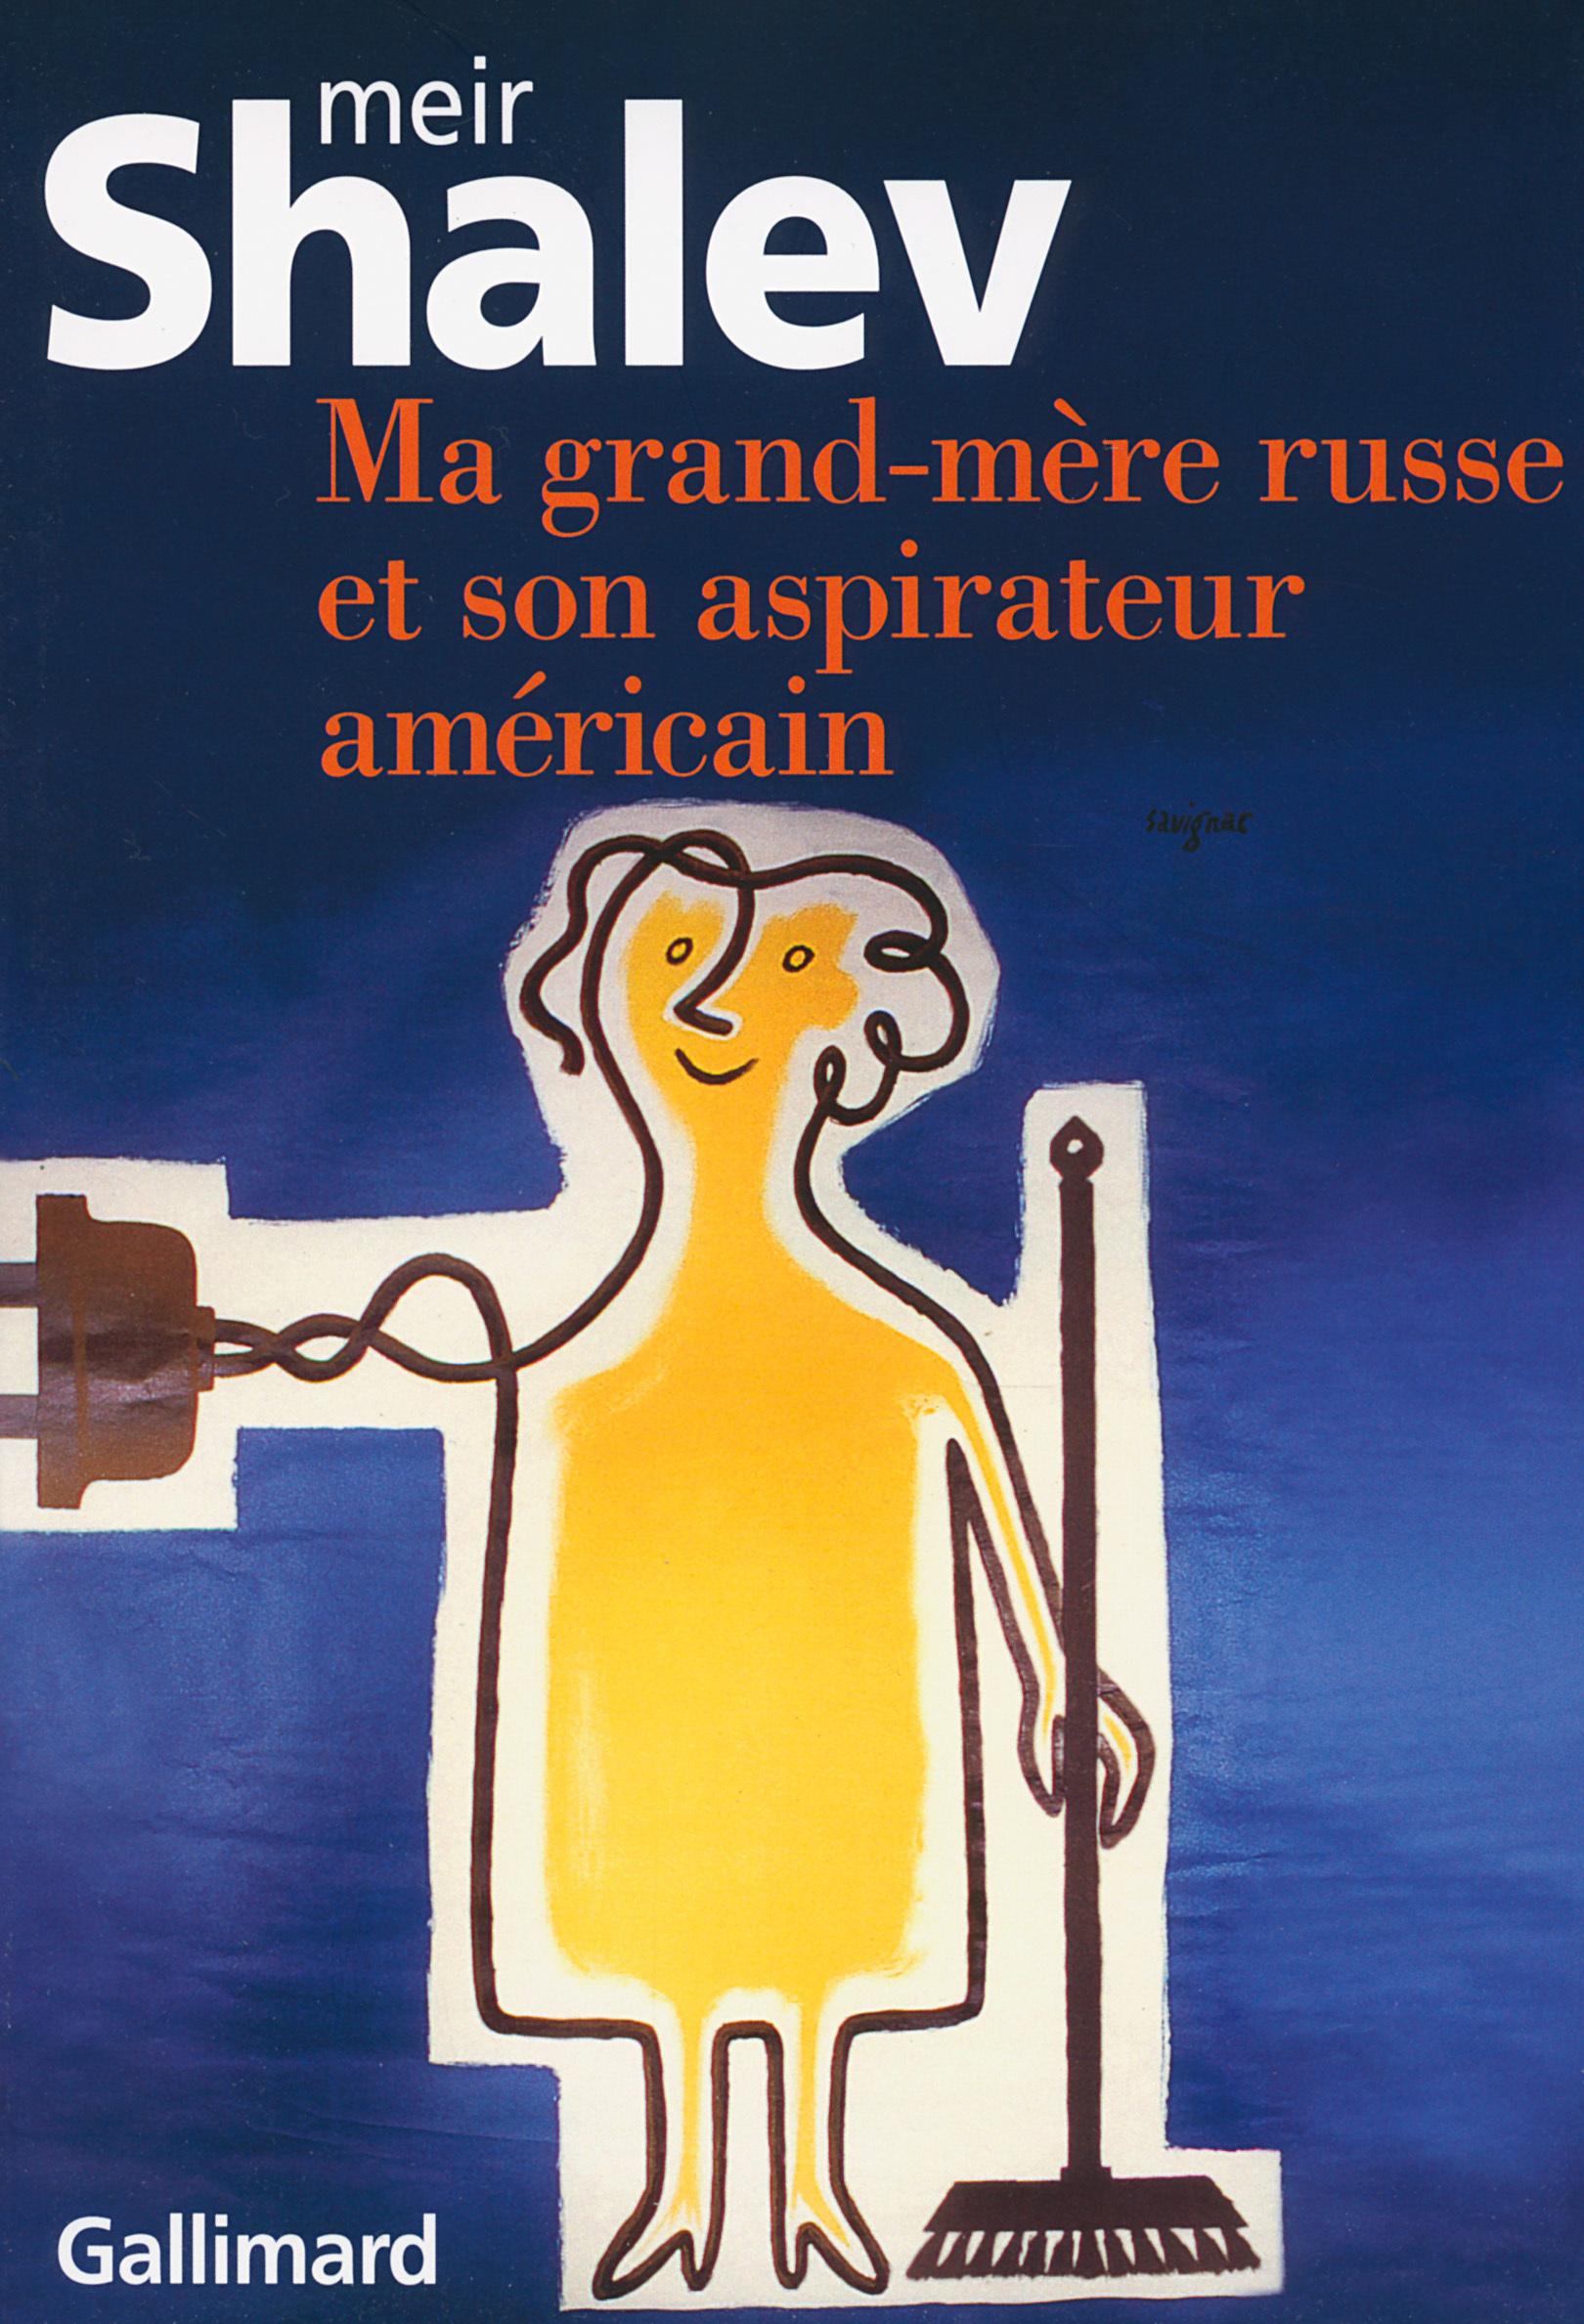 MA GRAND-MERE RUSSE ET SON ASPIRATEUR AMERICAIN